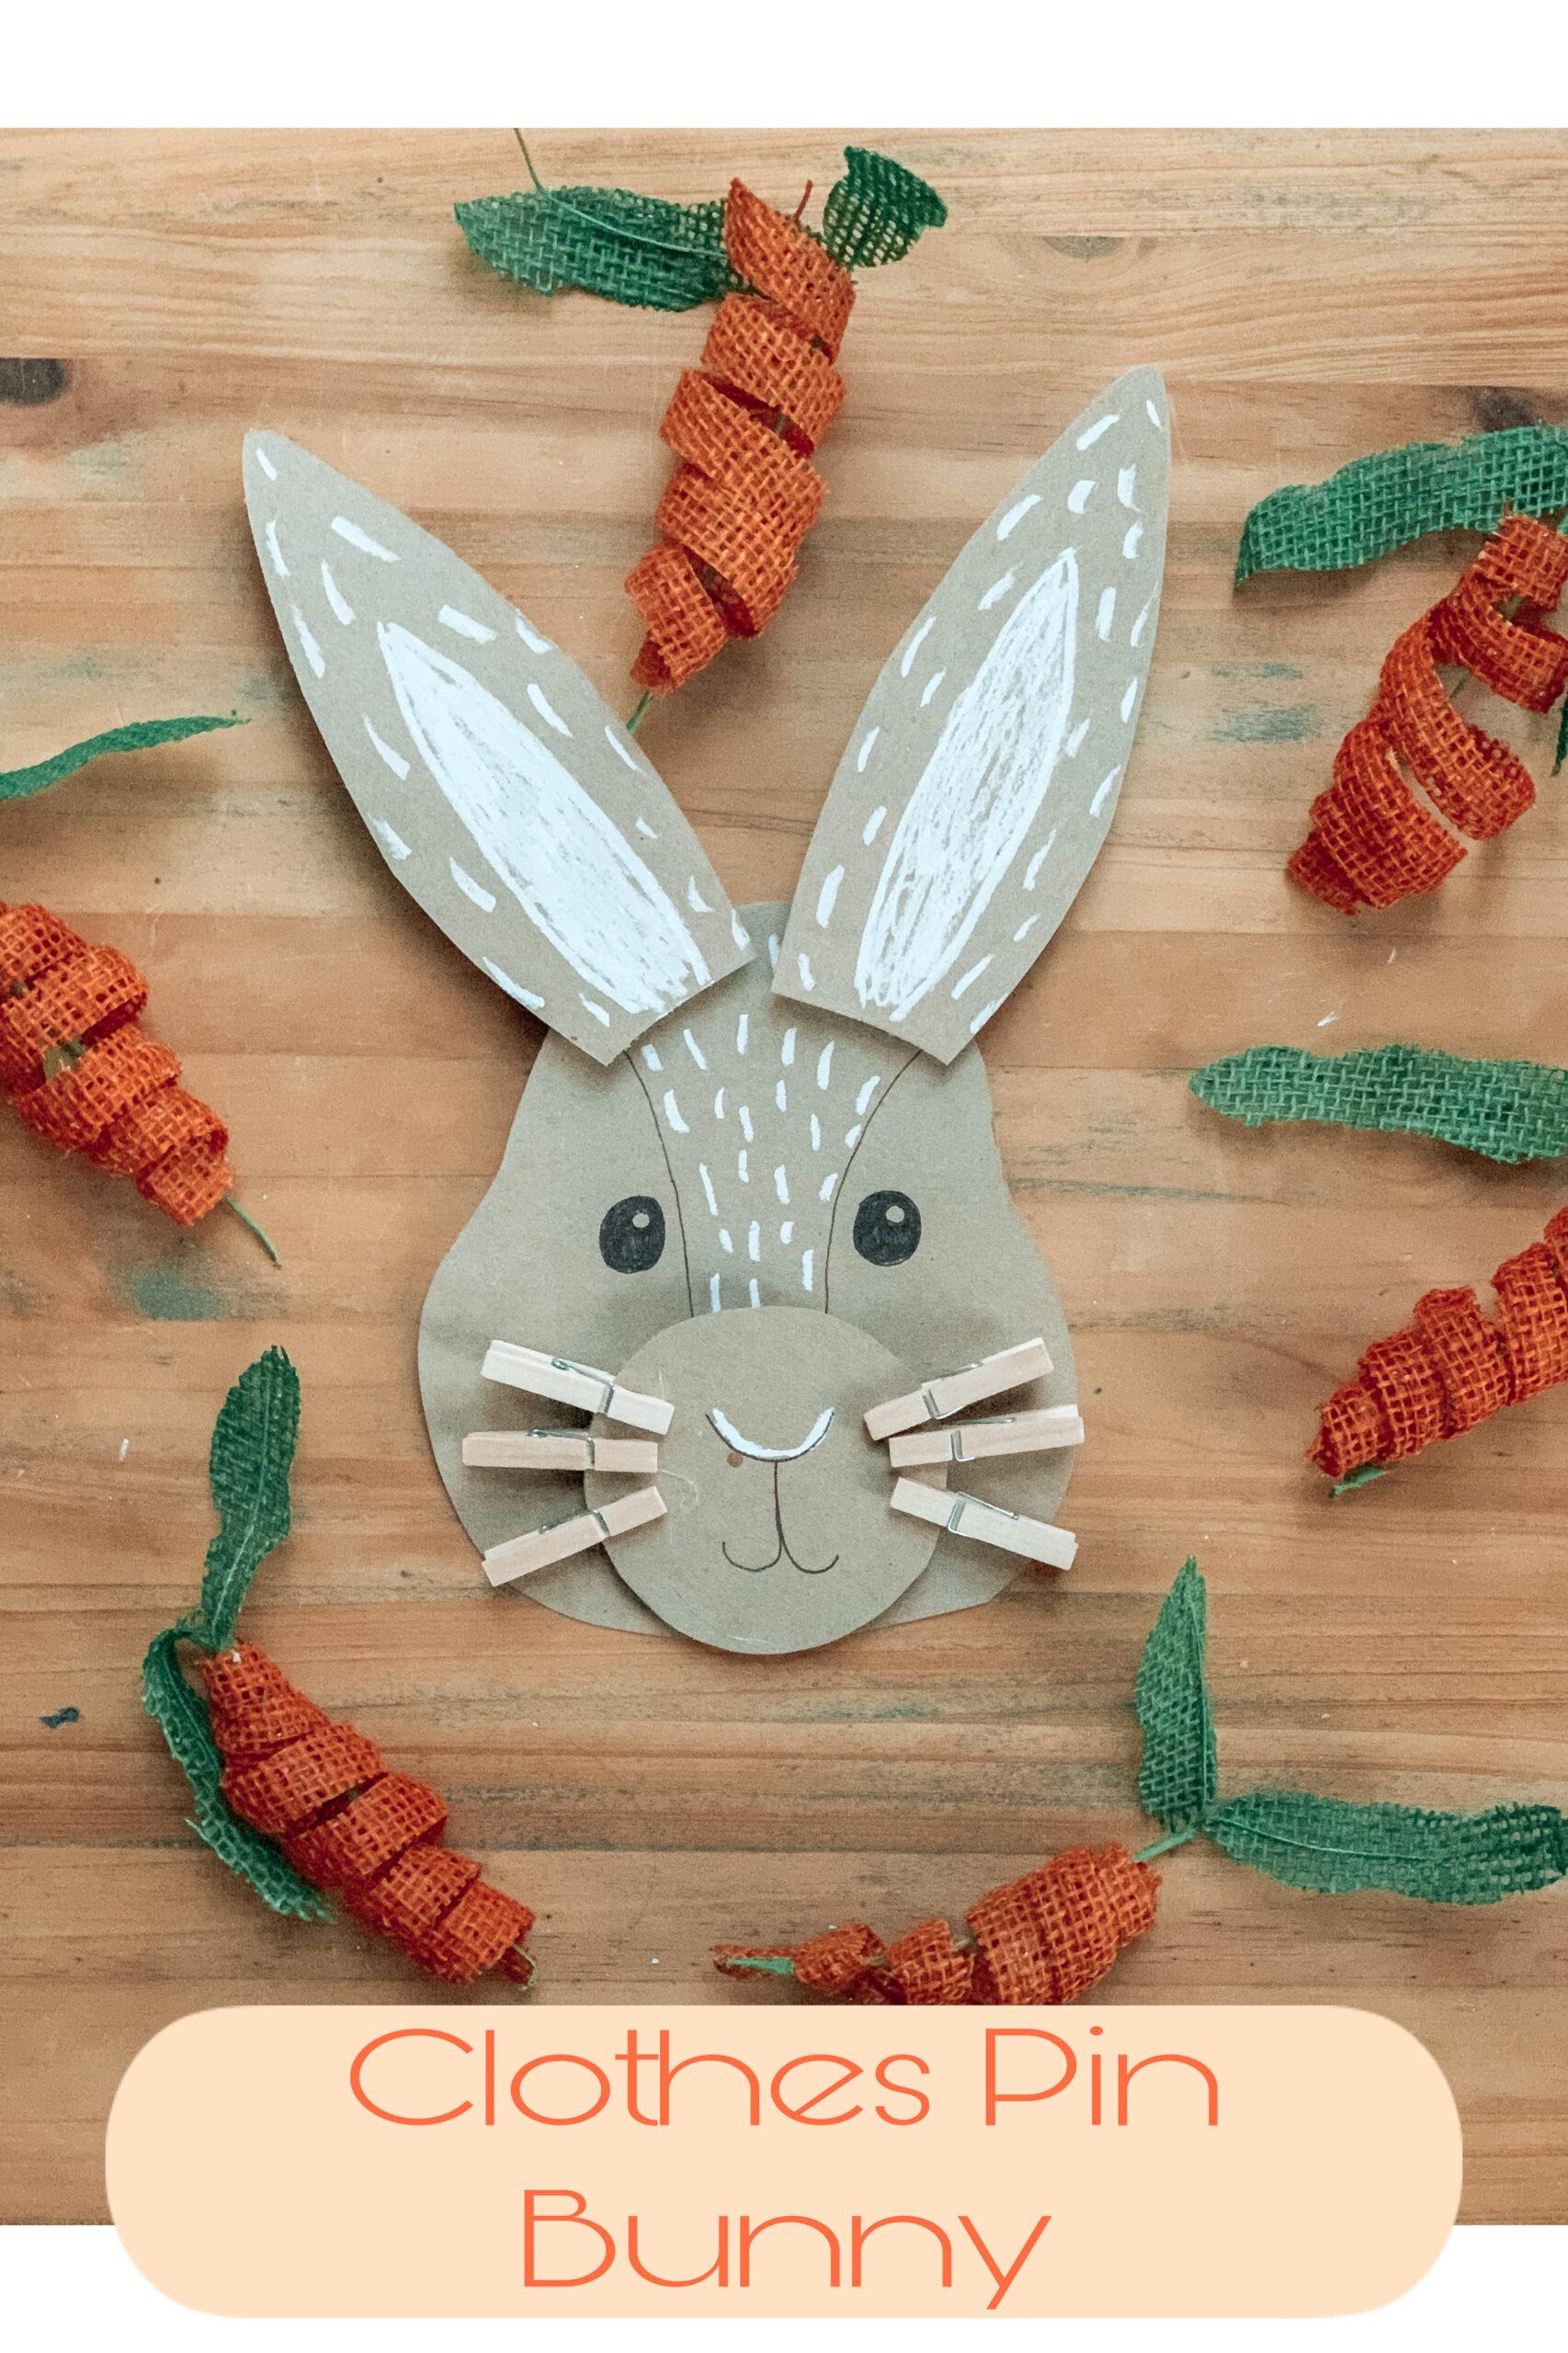 Clothes Pin Bunny